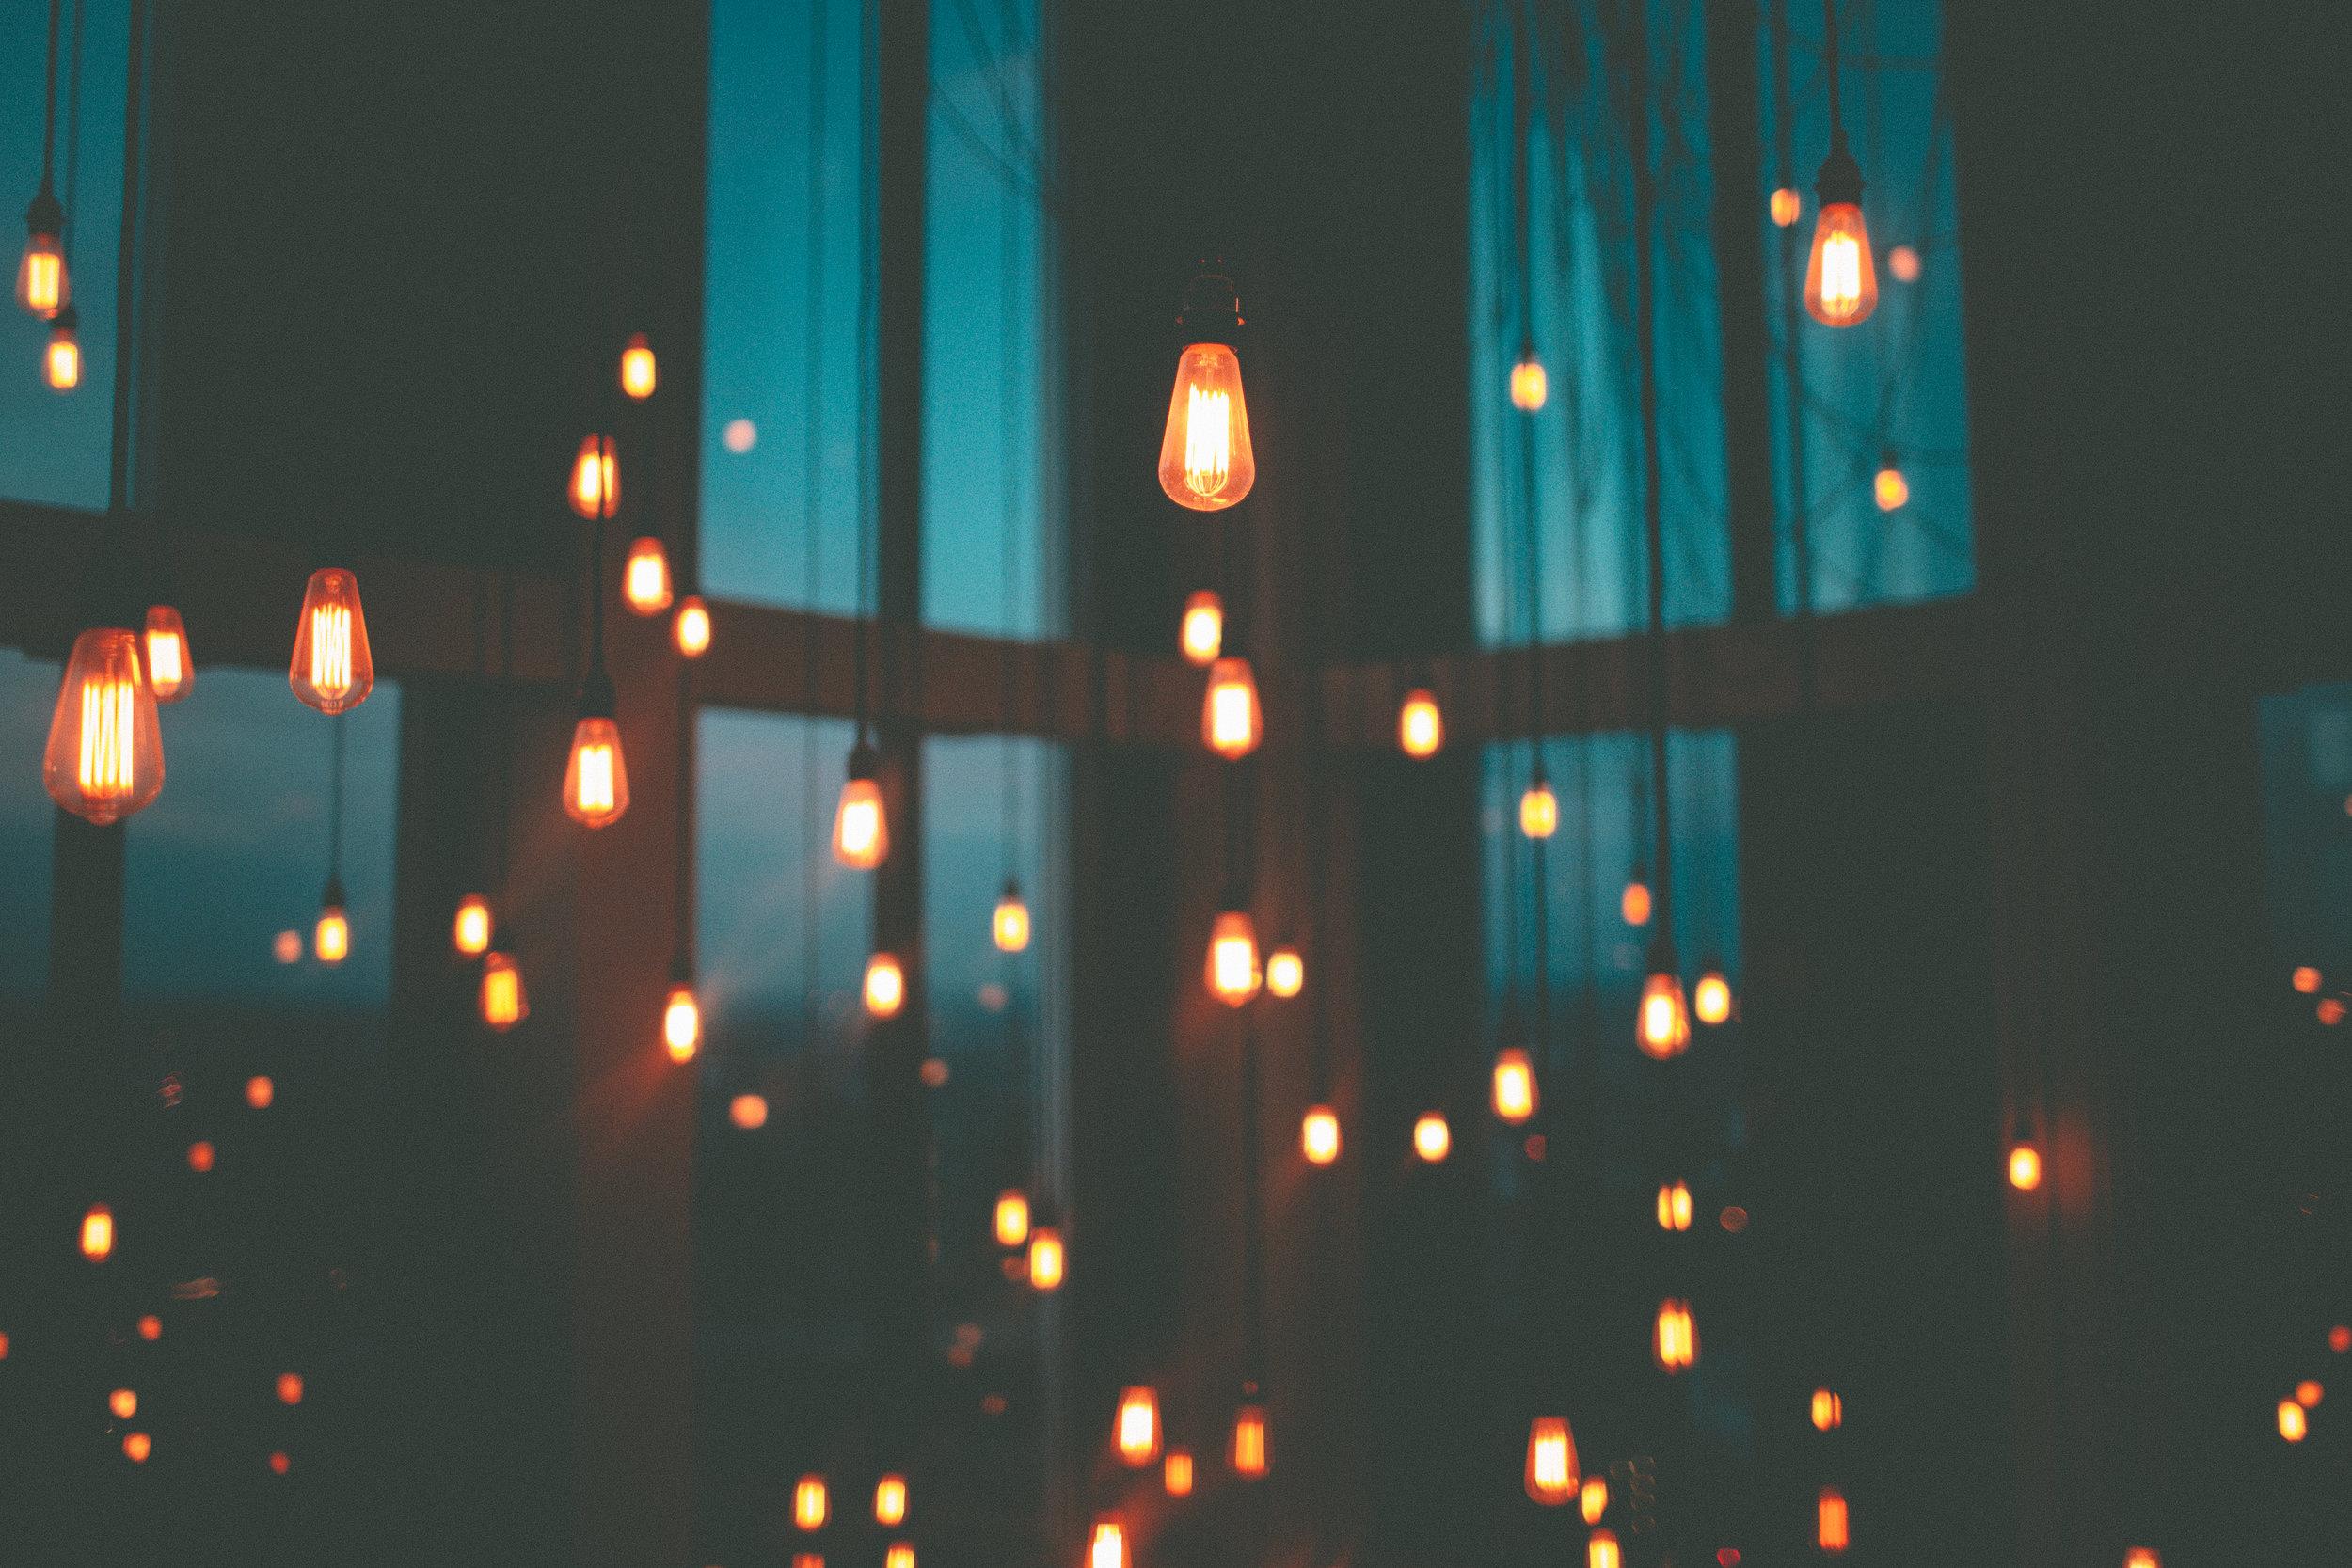 February 17, 2019 - Sermon - Doug Allison